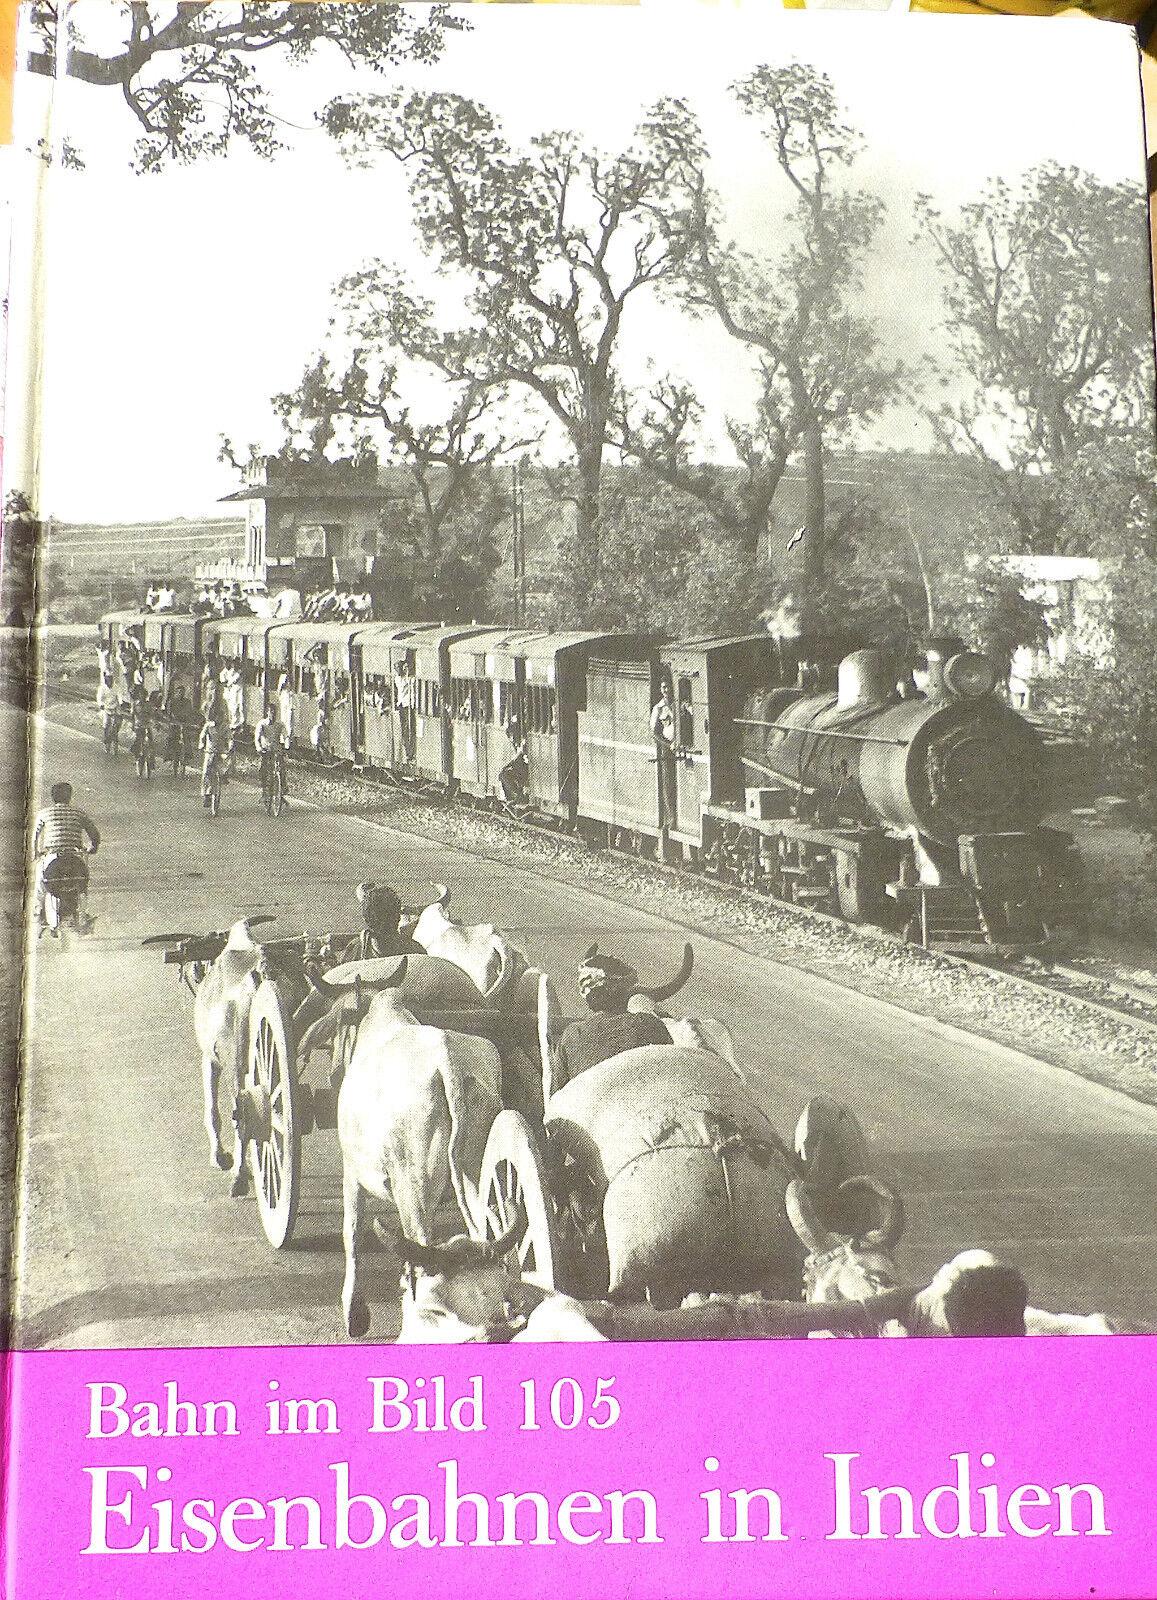 Railway in India Railway in picture 105 HI4 Å